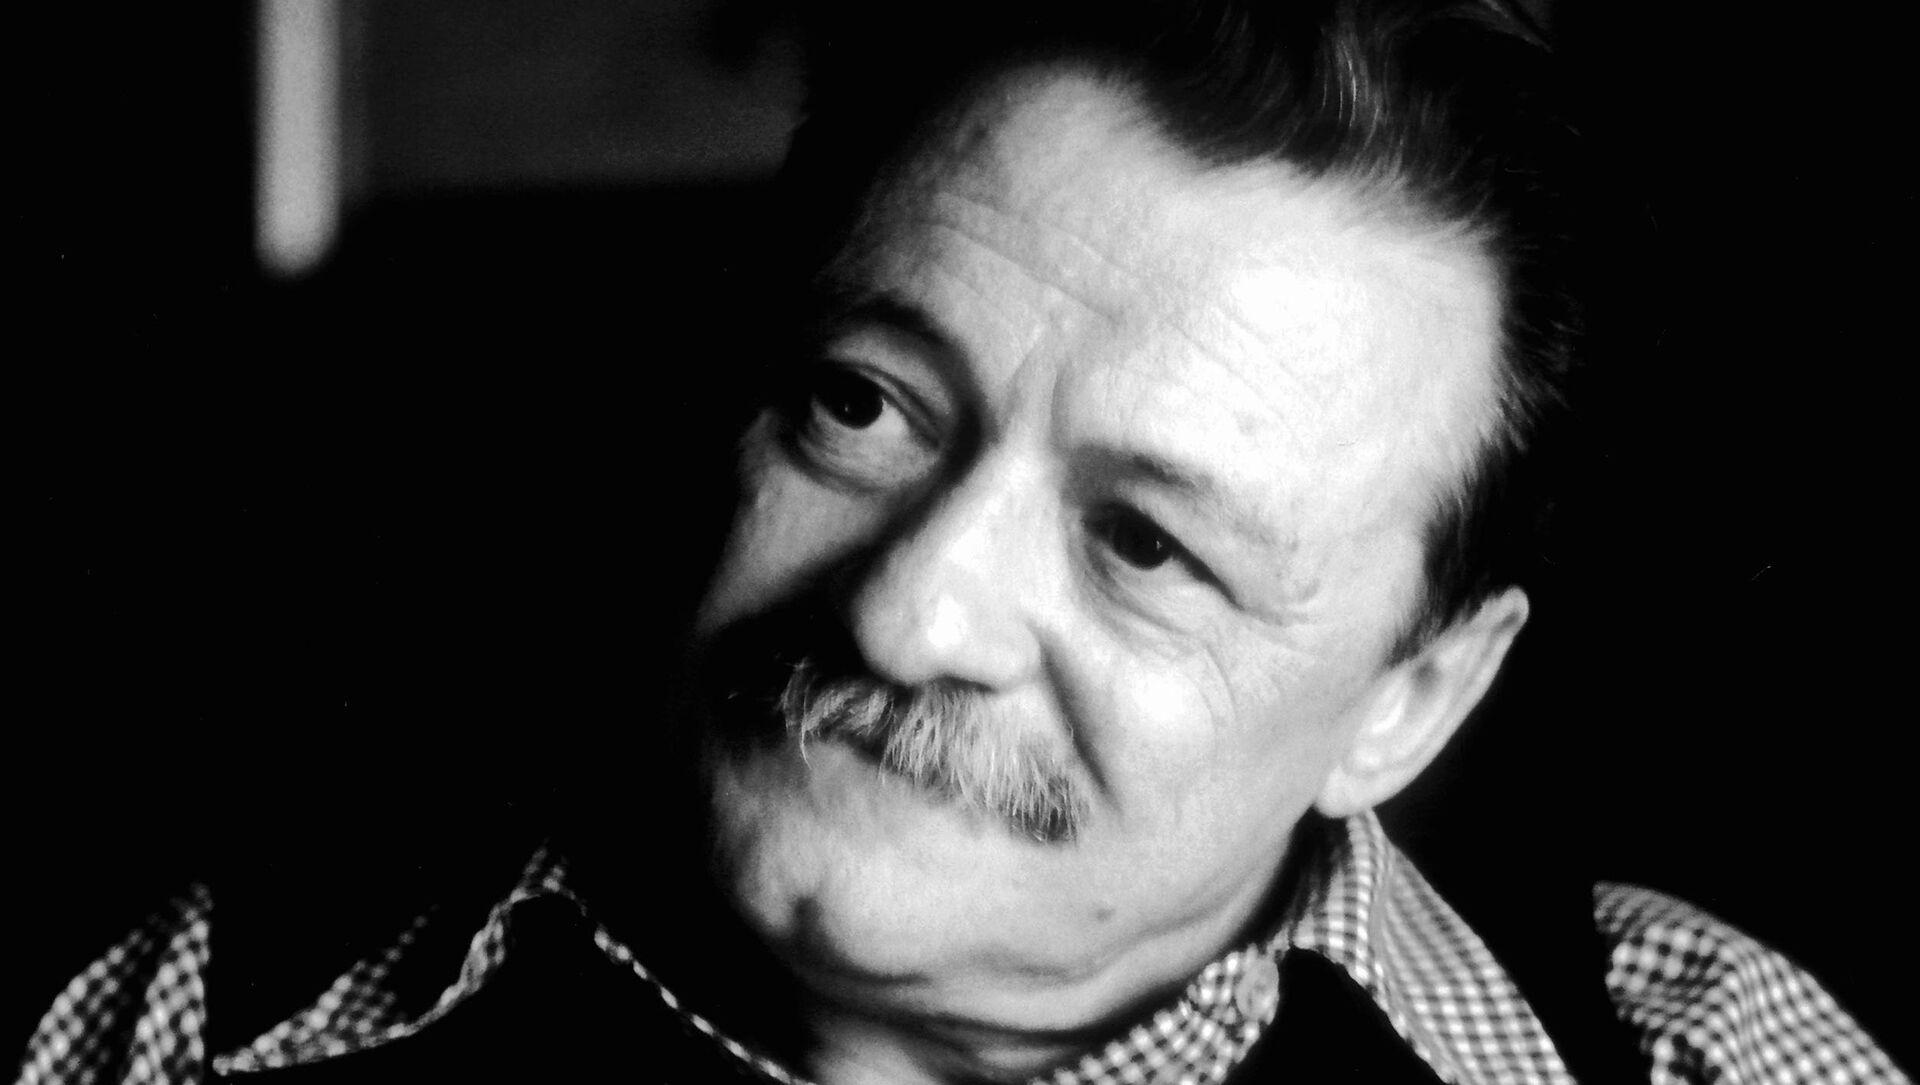 Mario Benedetti, escritor uruguayo - Sputnik Mundo, 1920, 14.09.2020